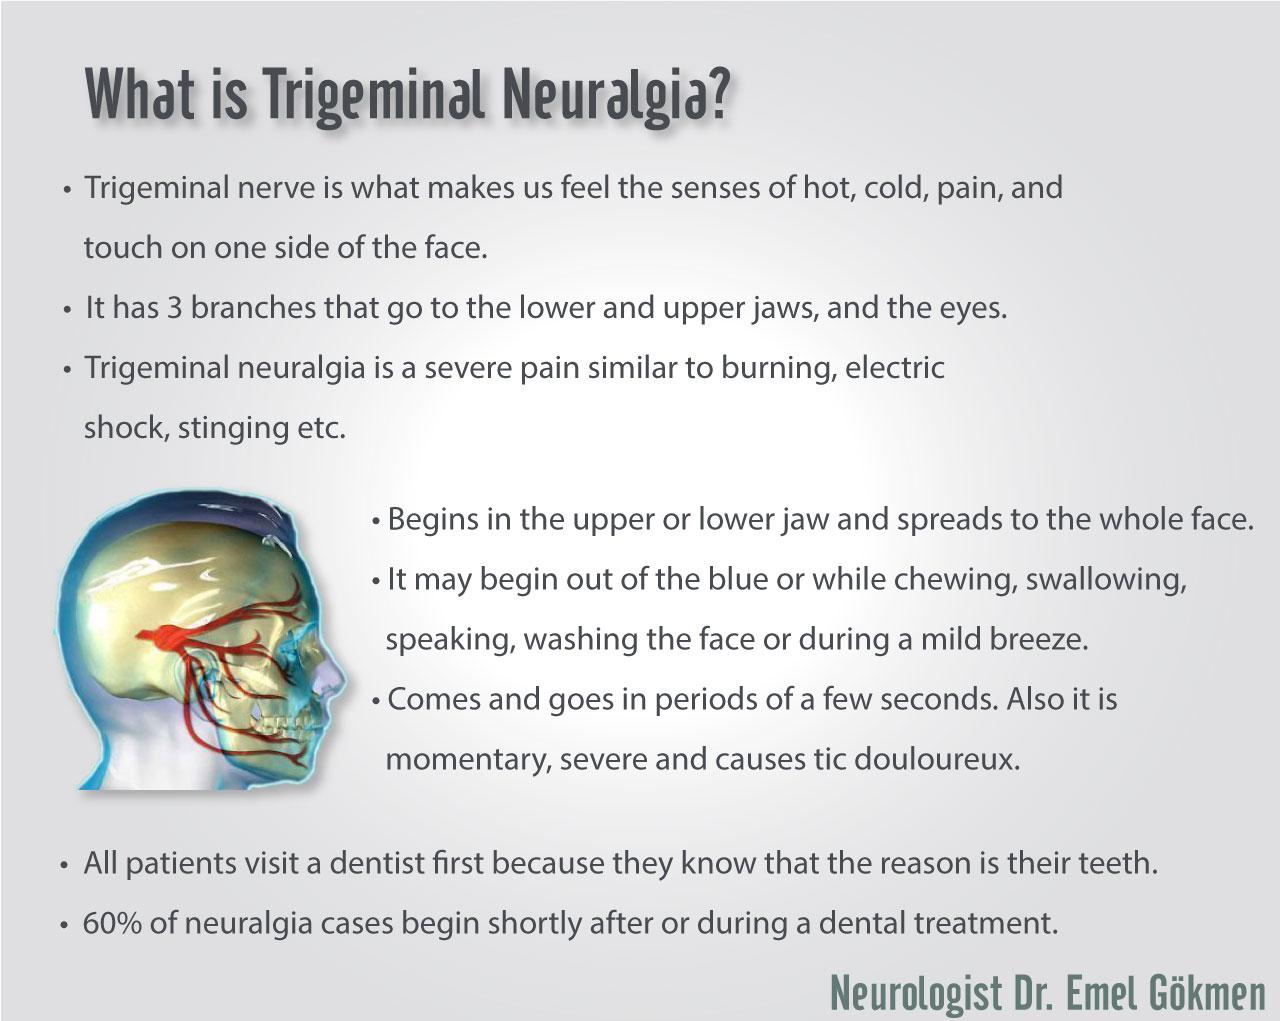 Trigeminal neuralgia infographic Dr. Emel Gokmen